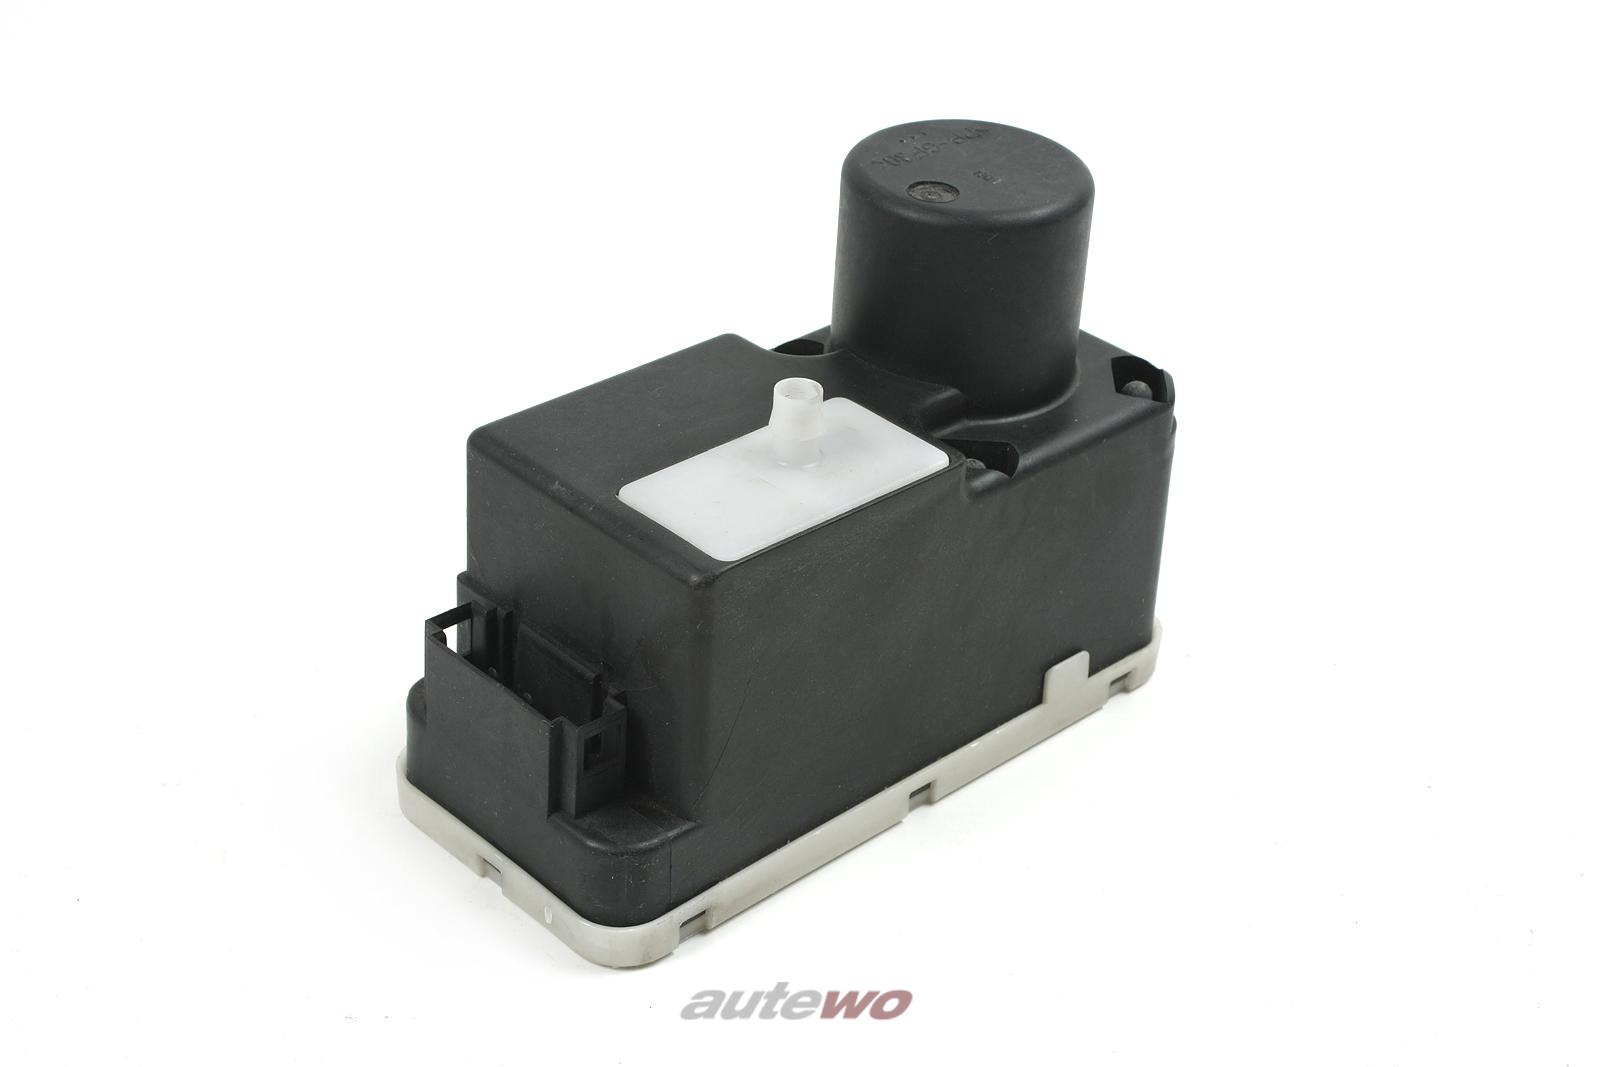 6n0962257 vw polo 6n pumpe zentralverriegelung steuerger t. Black Bedroom Furniture Sets. Home Design Ideas